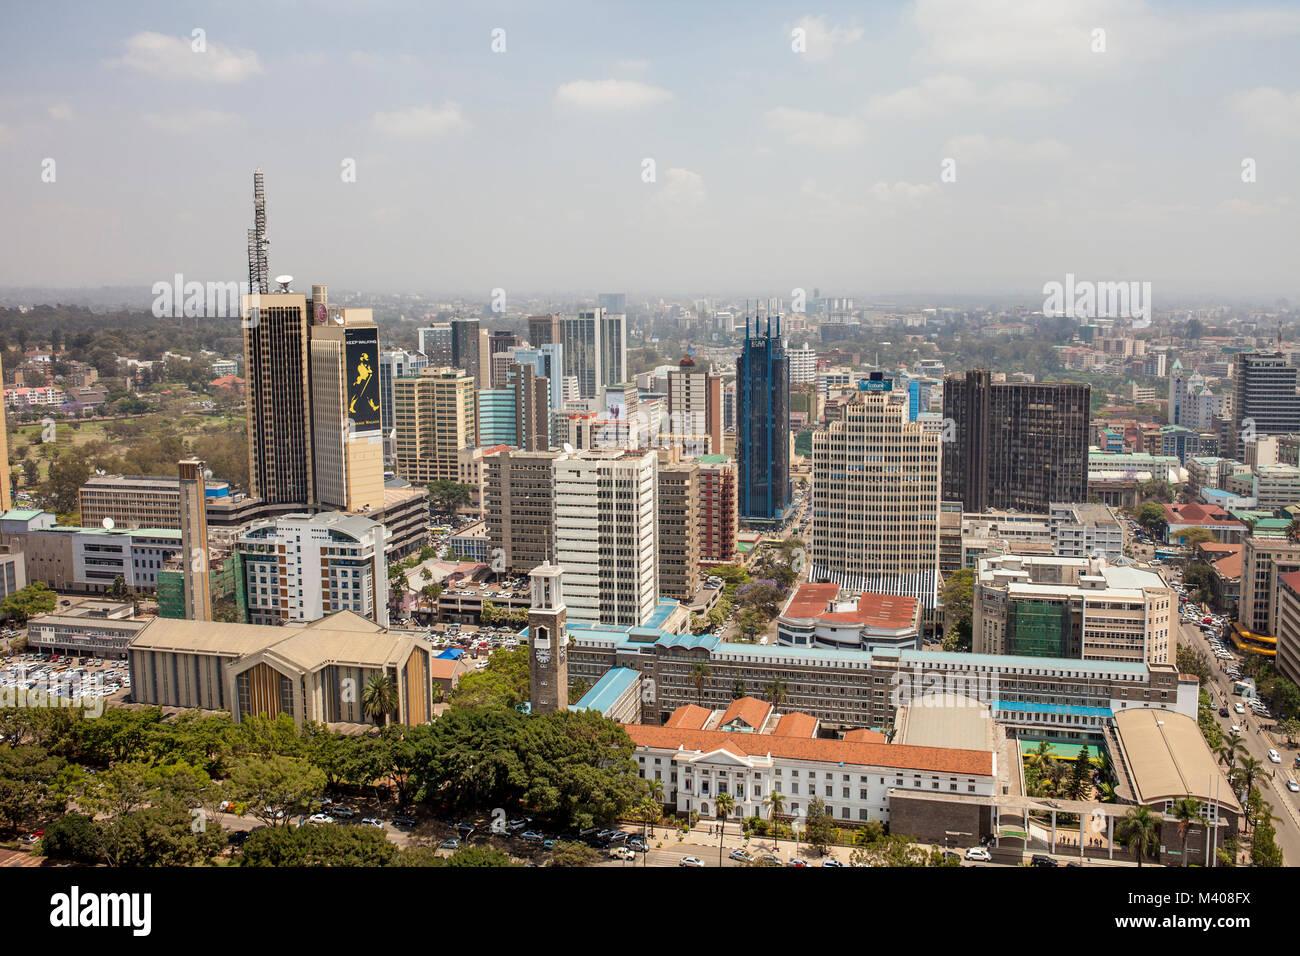 471289a5aba NAIROBI